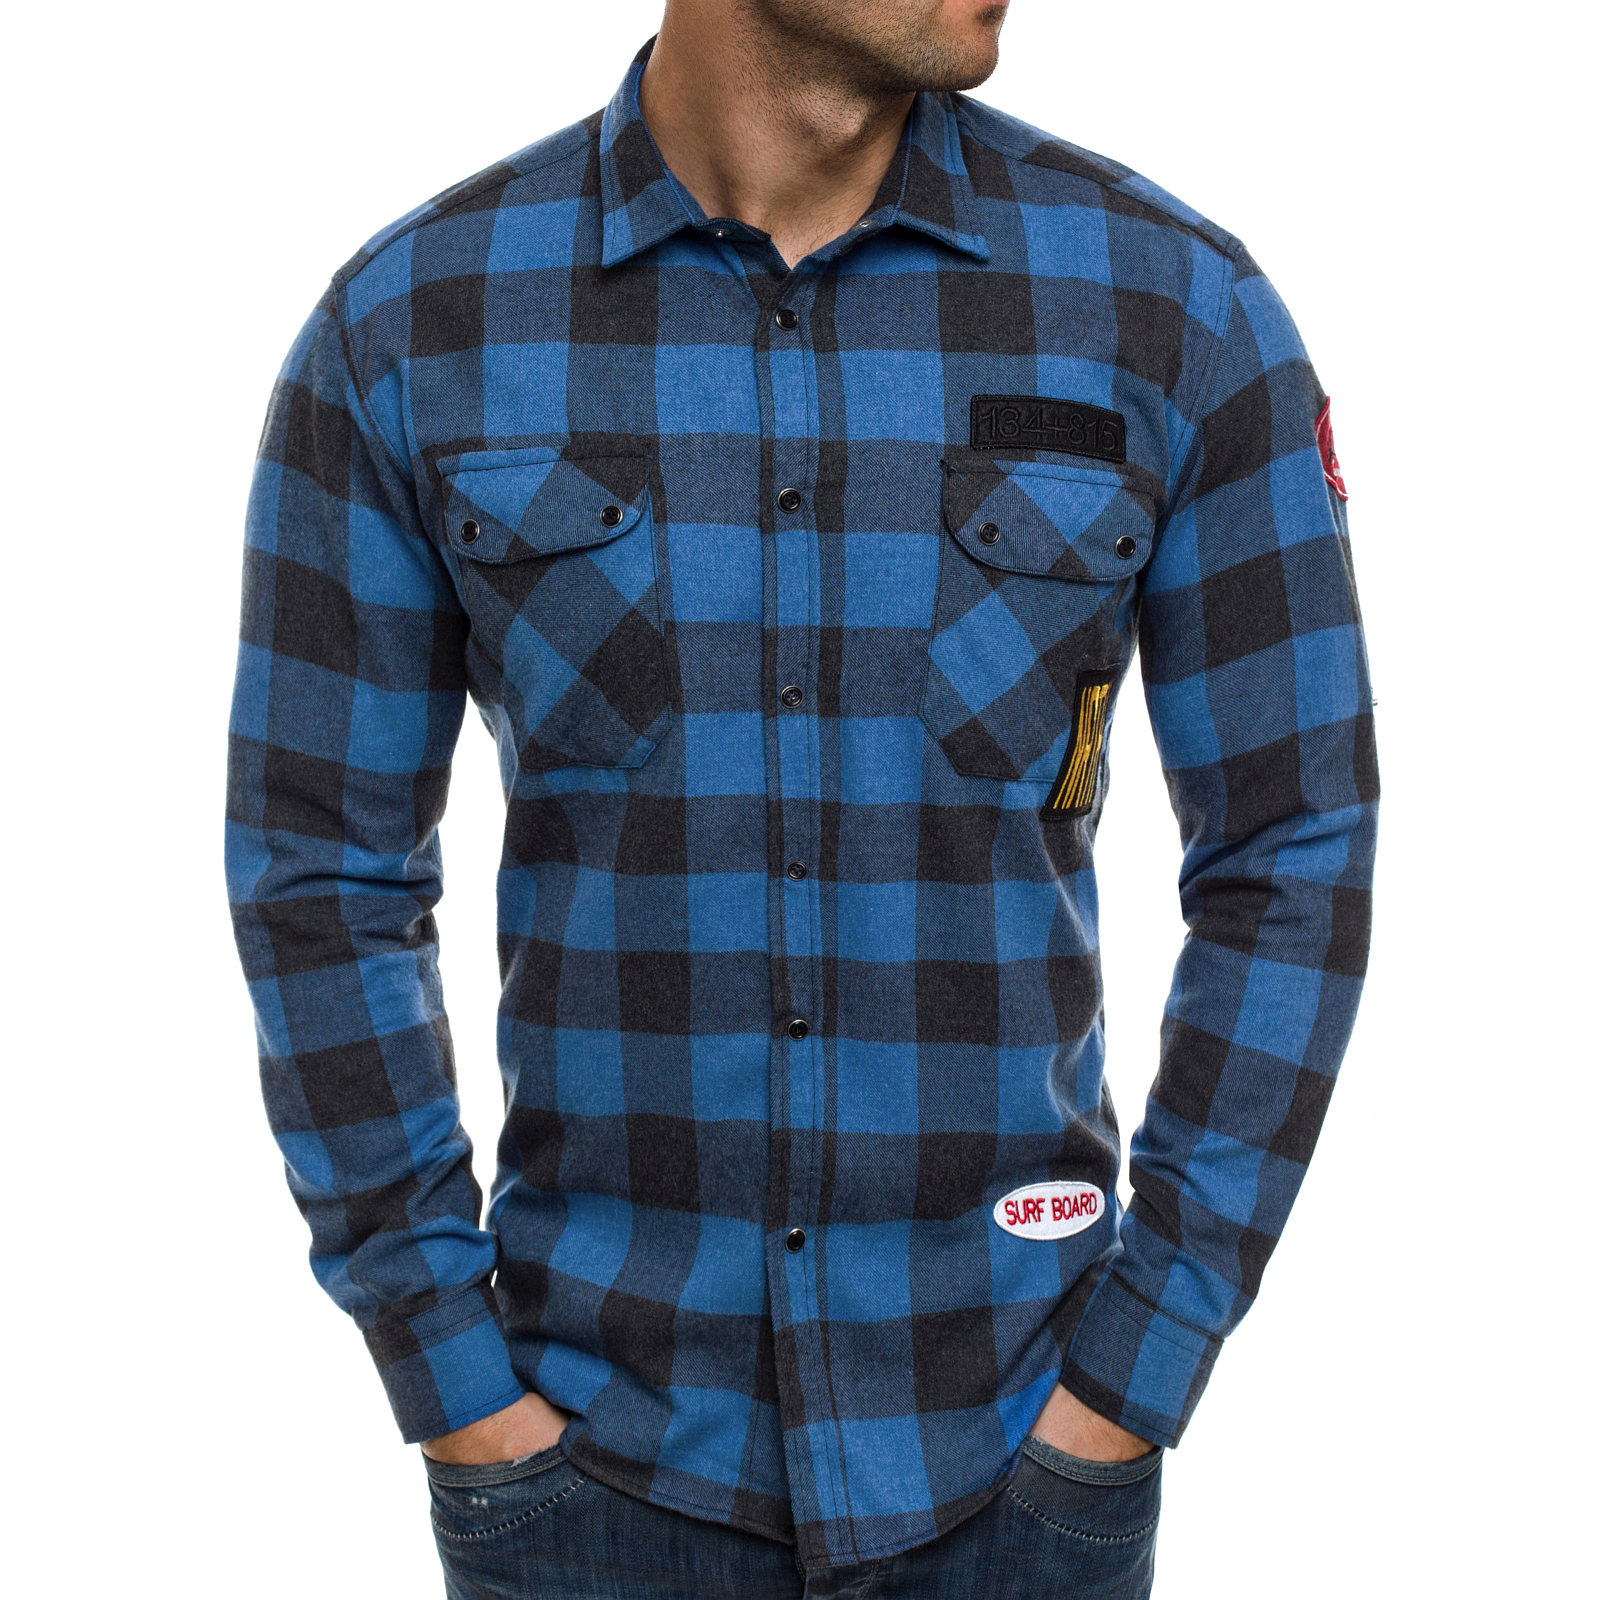 Camisa Vaquera Camiseta Flojo Ceñido Slim Fit Hombre Ozonee 3546 Mix ... 41c0be06c6b